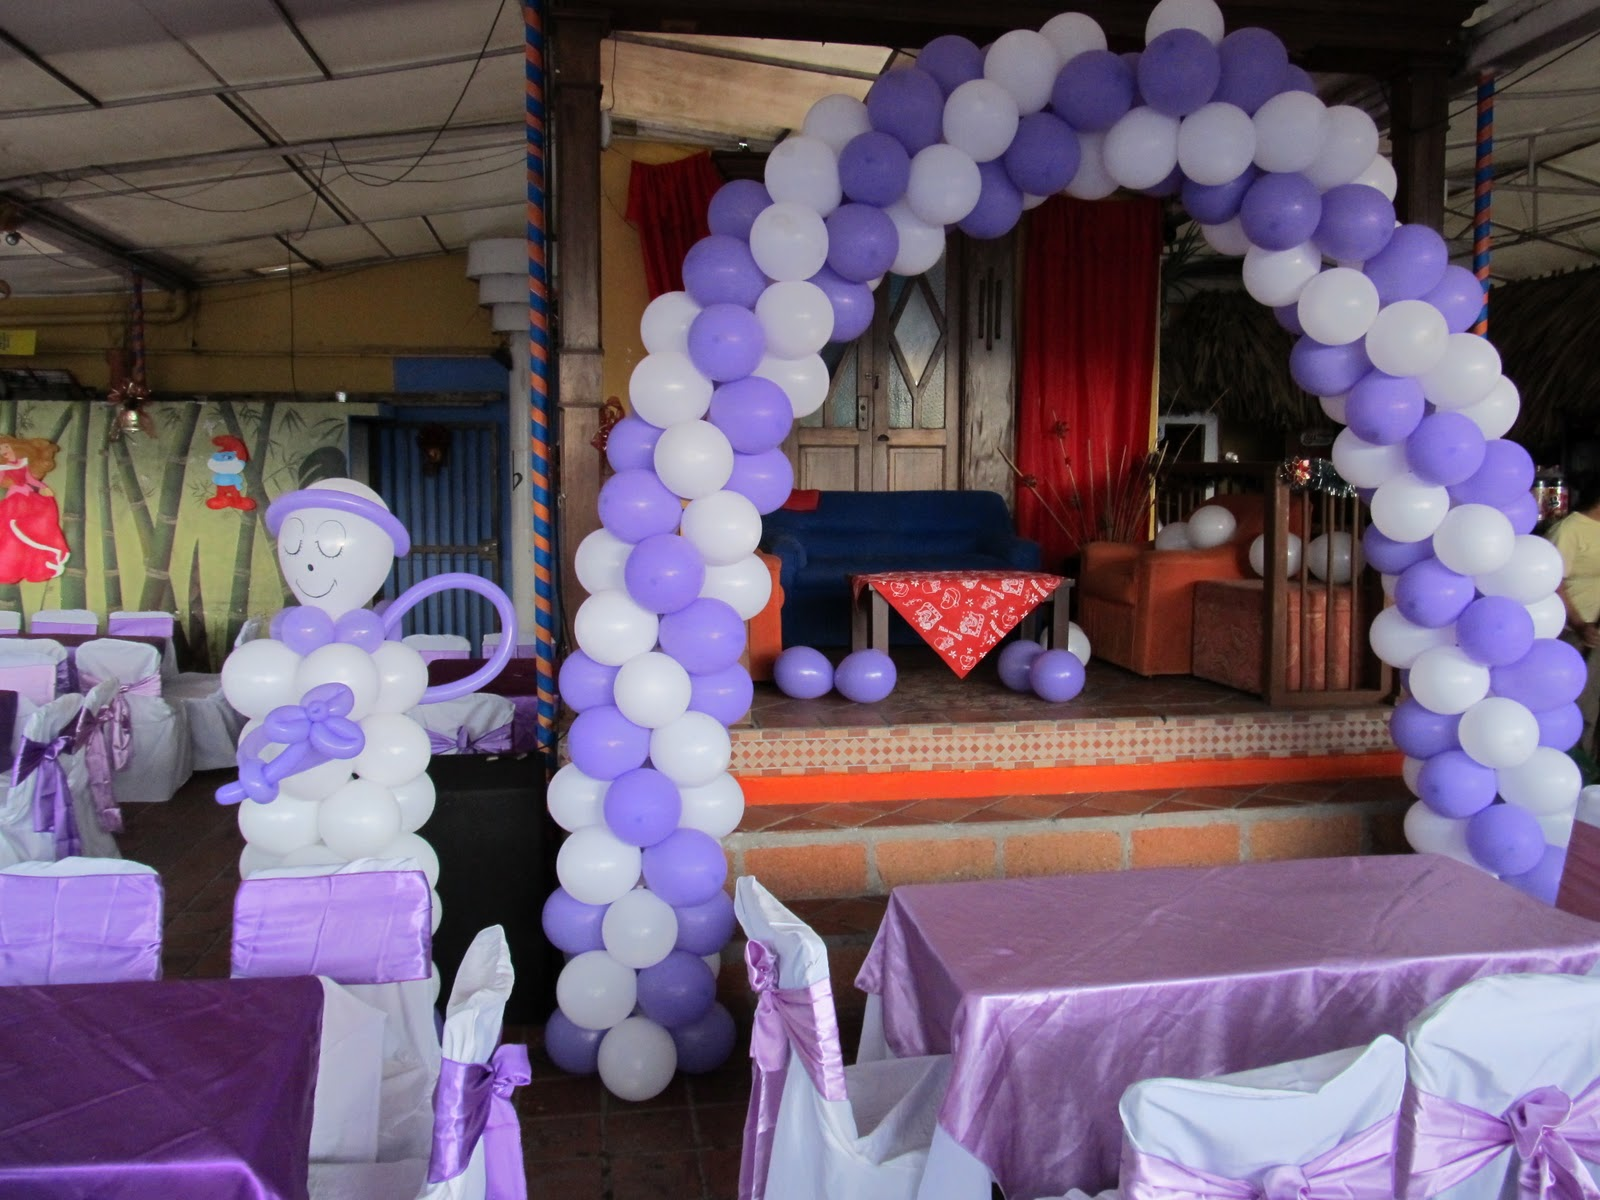 Decoracion con globos primera comunion recreacionistas - Decoracion bodas con globos ...